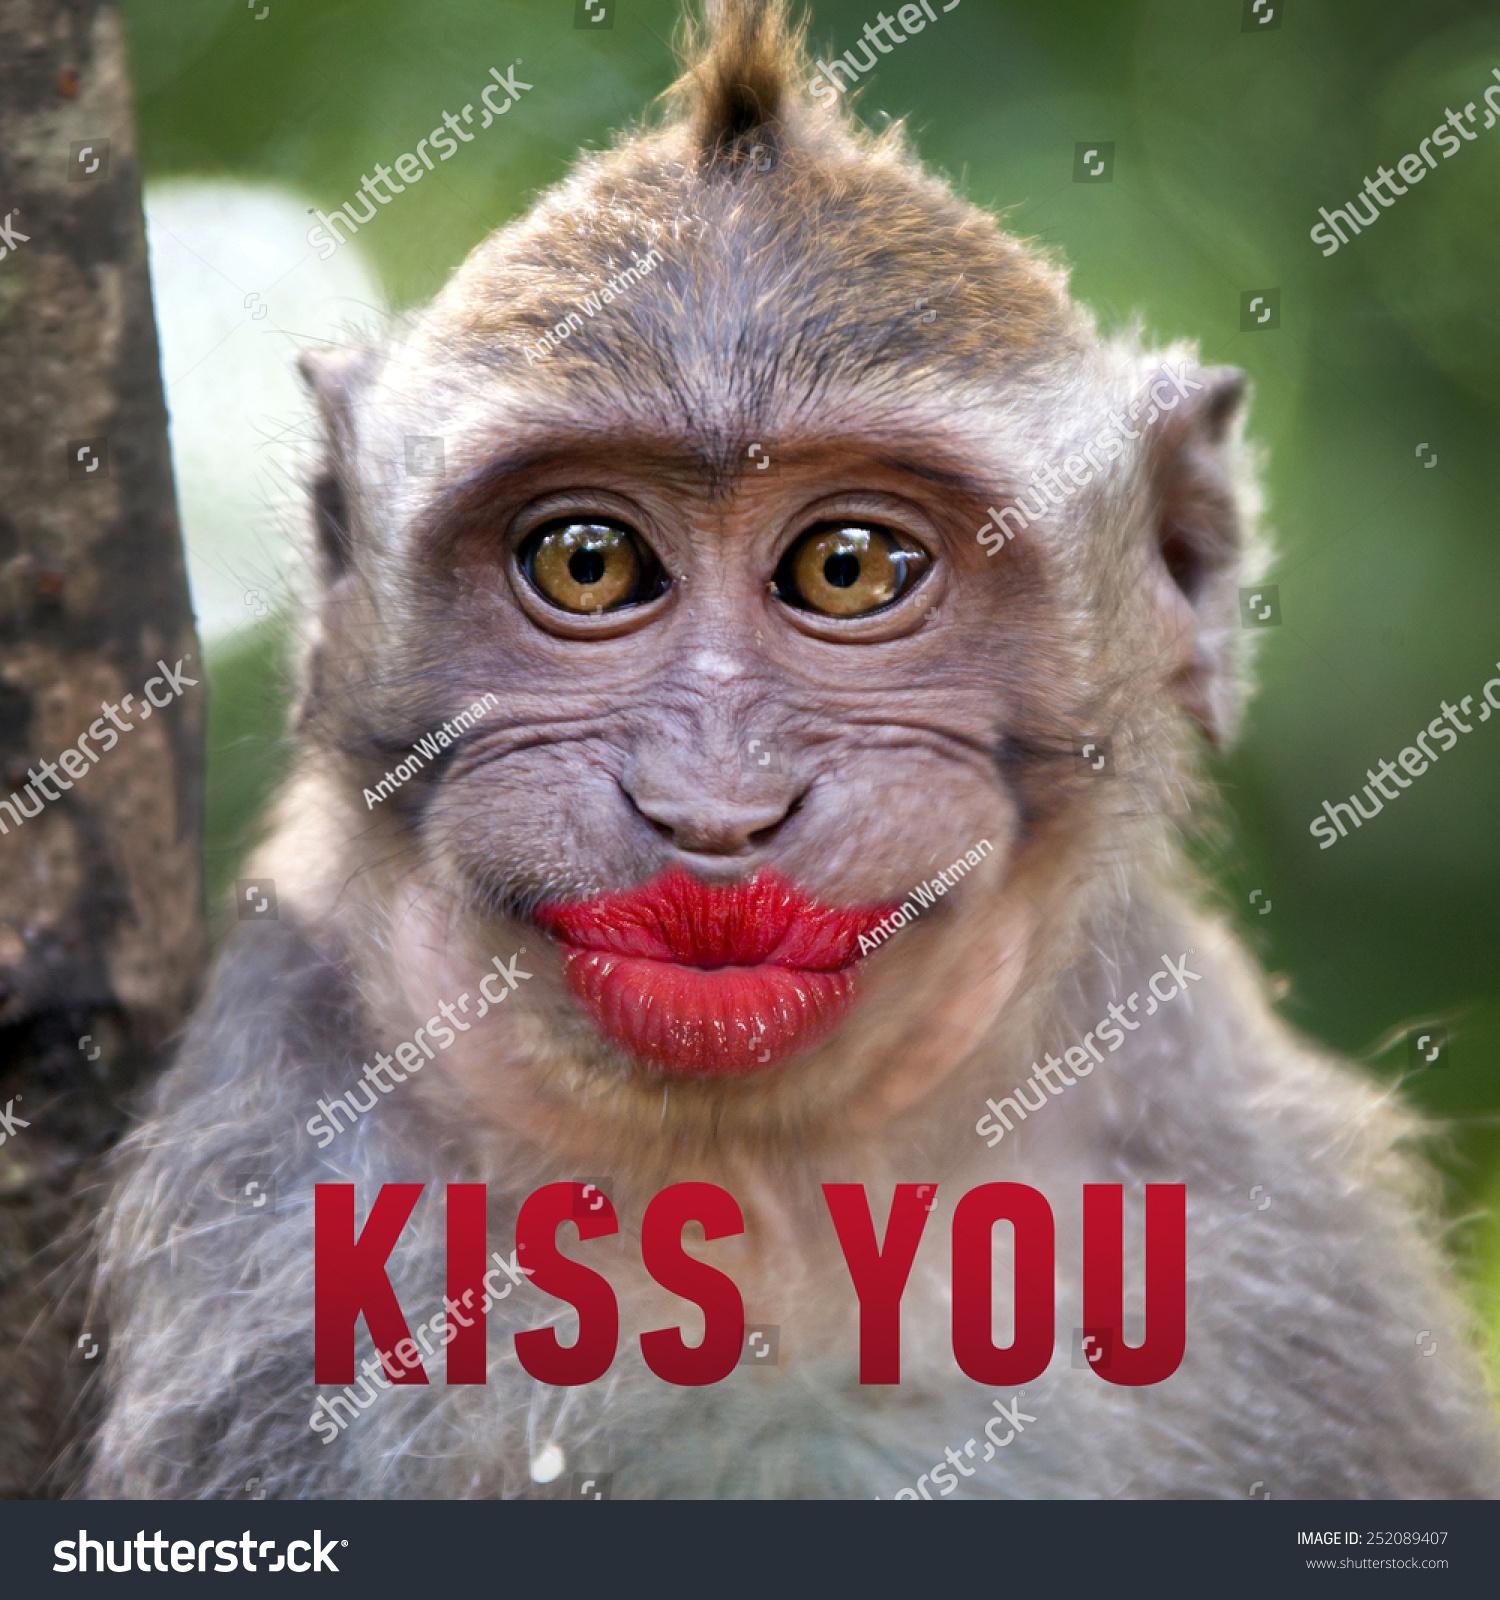 Big Kiss Funny funny monkey big red lips words stock photo 252089407 ...